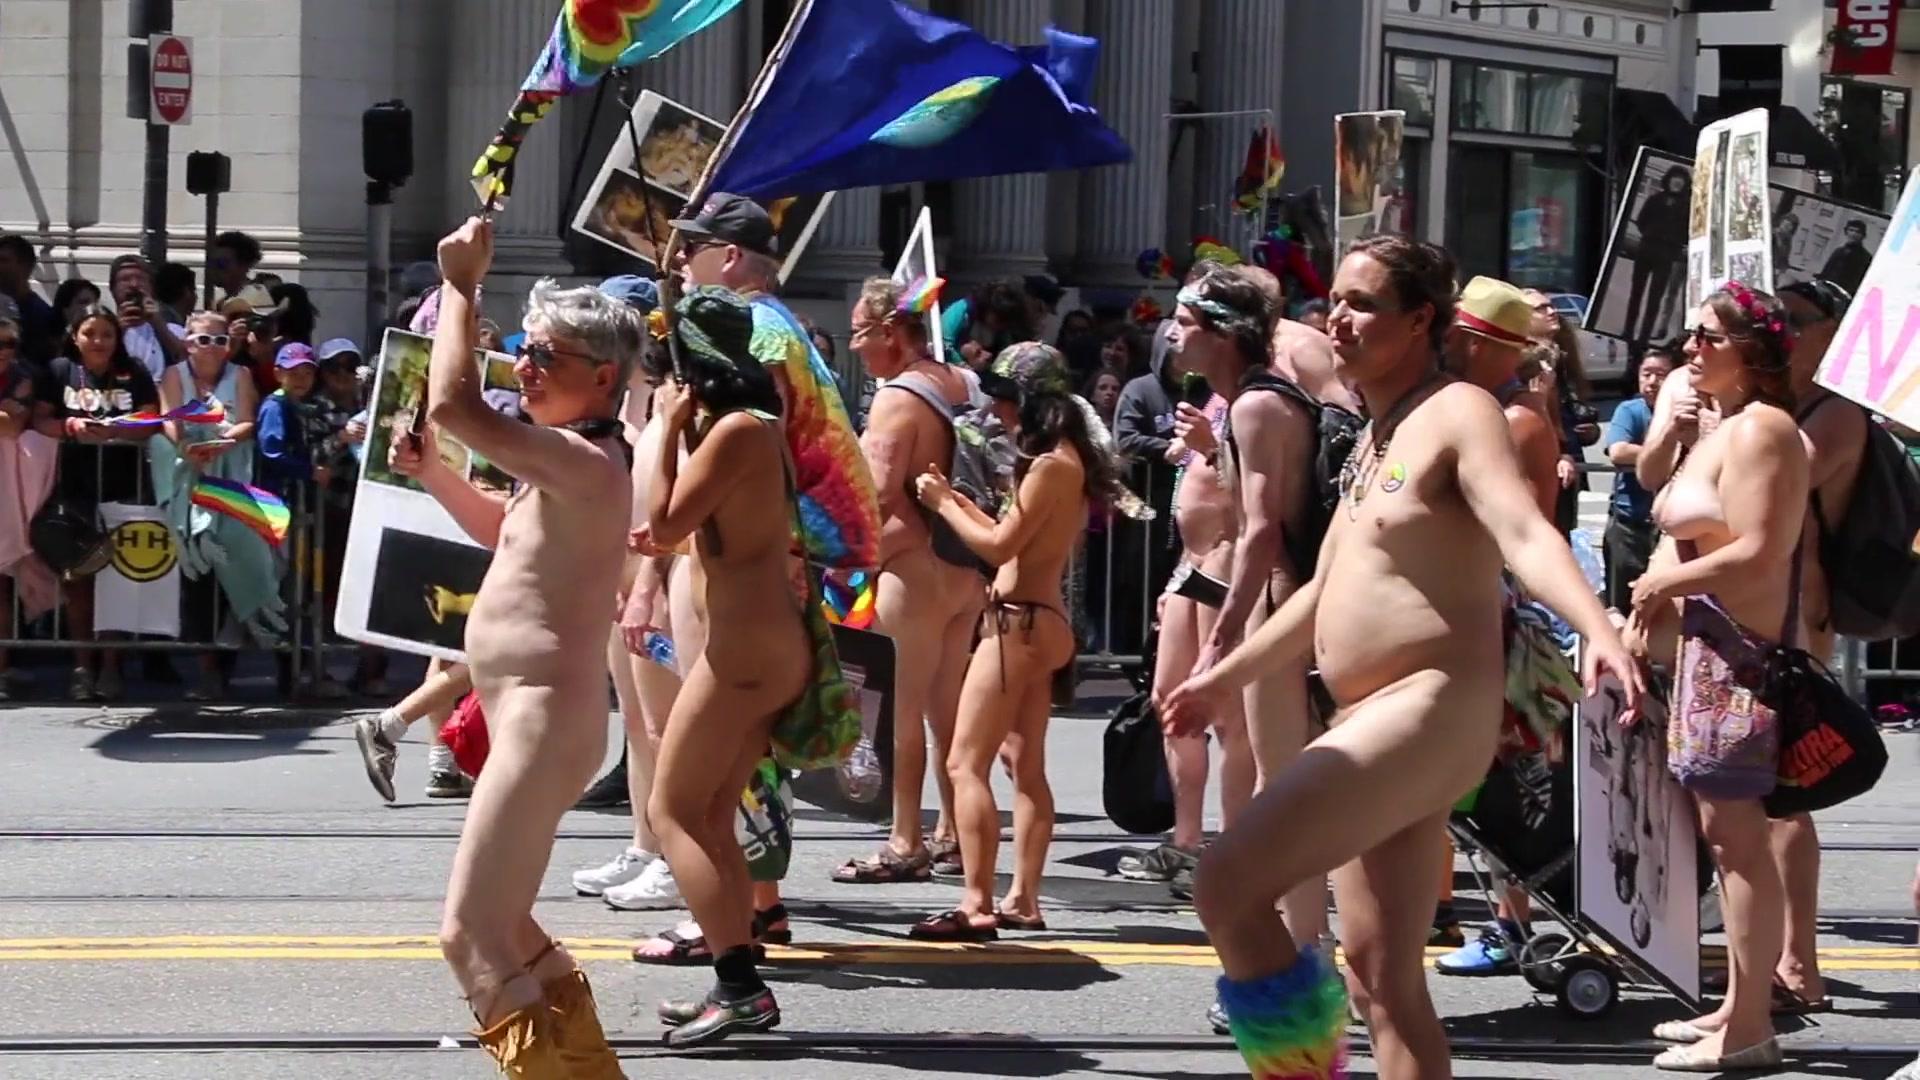 Nude loveparade 2nd Rally